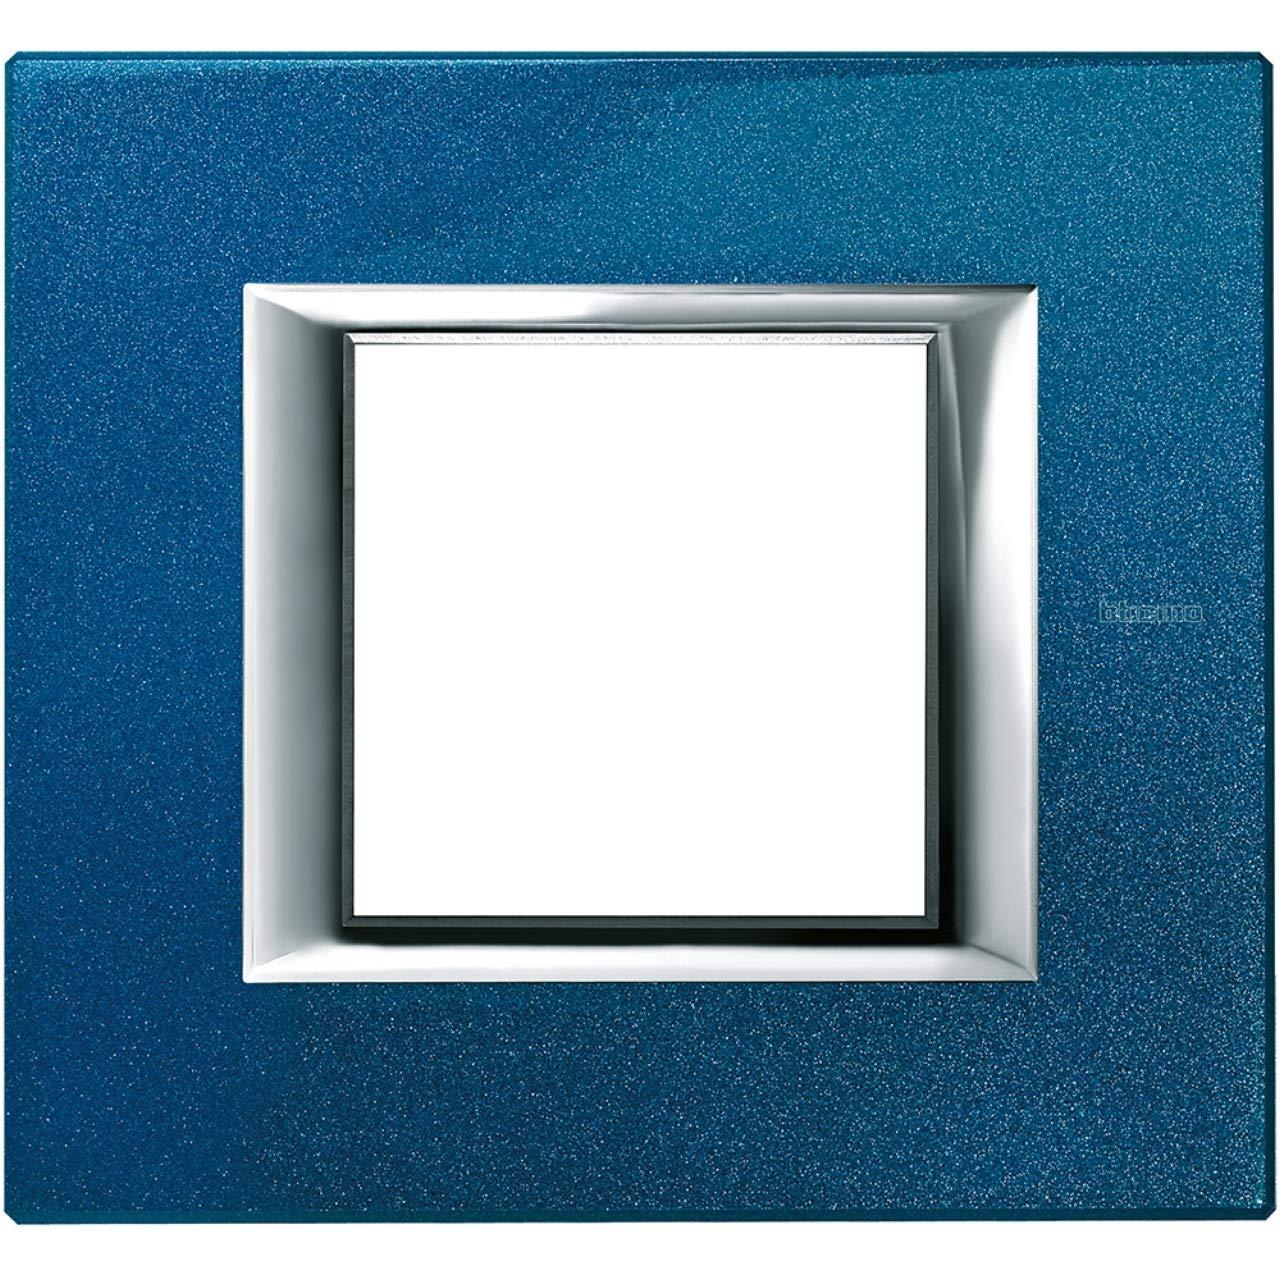 Placa 2 m/ódulo axolute azul meissen Bticino axolute